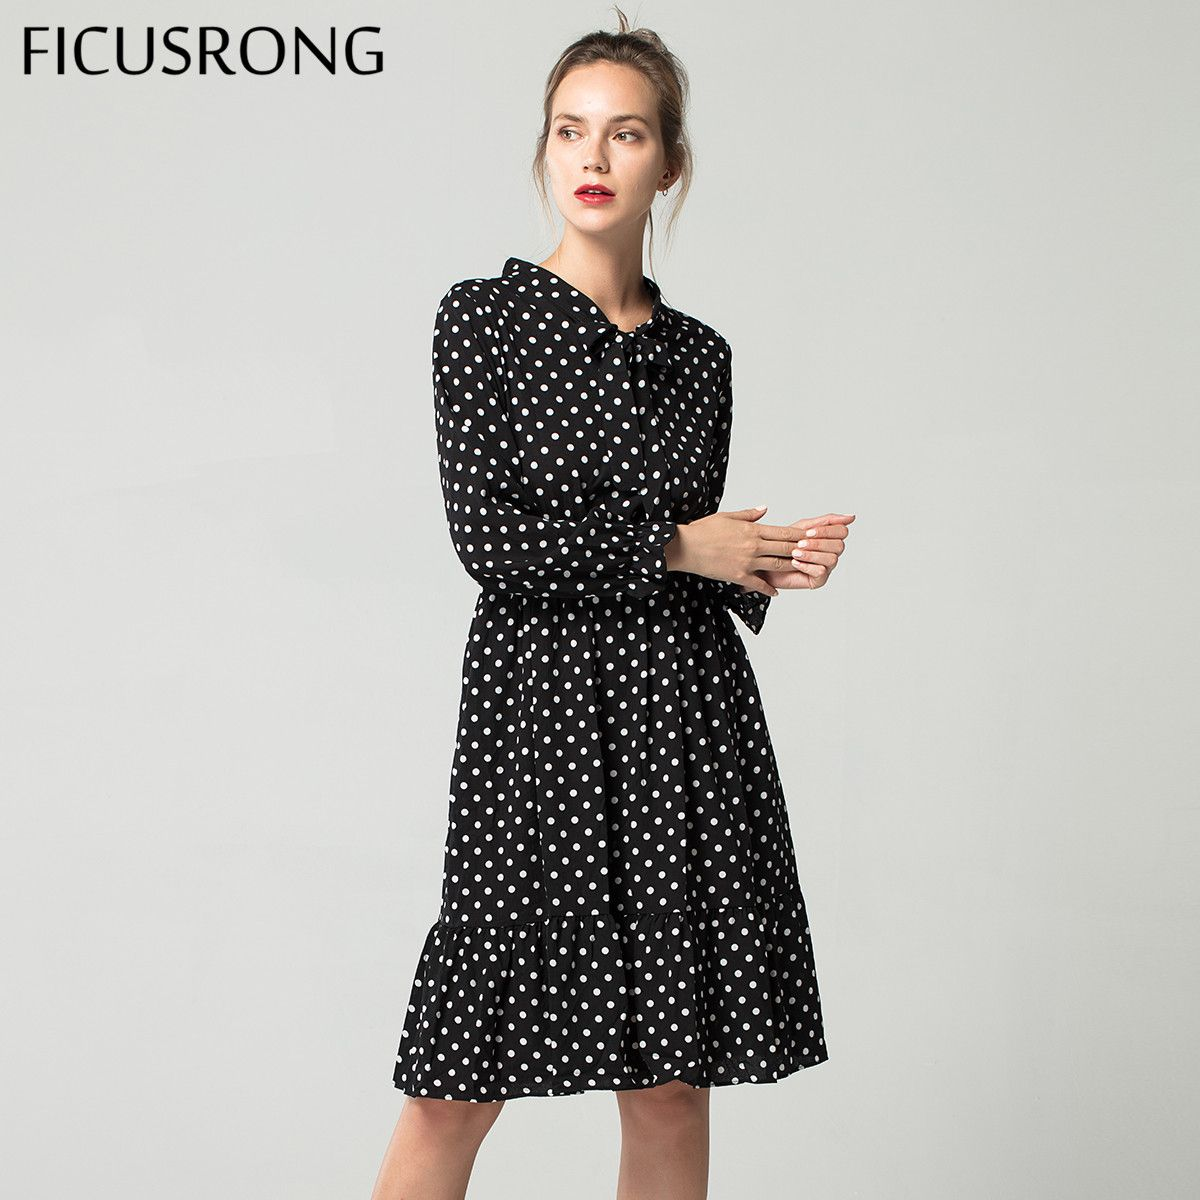 2019 Spring Chiffon Shirt Dresses Office Polka Dot Vintage Dress Women Long Sleeved Summer Midi Floral Dress Female FICUSRONG